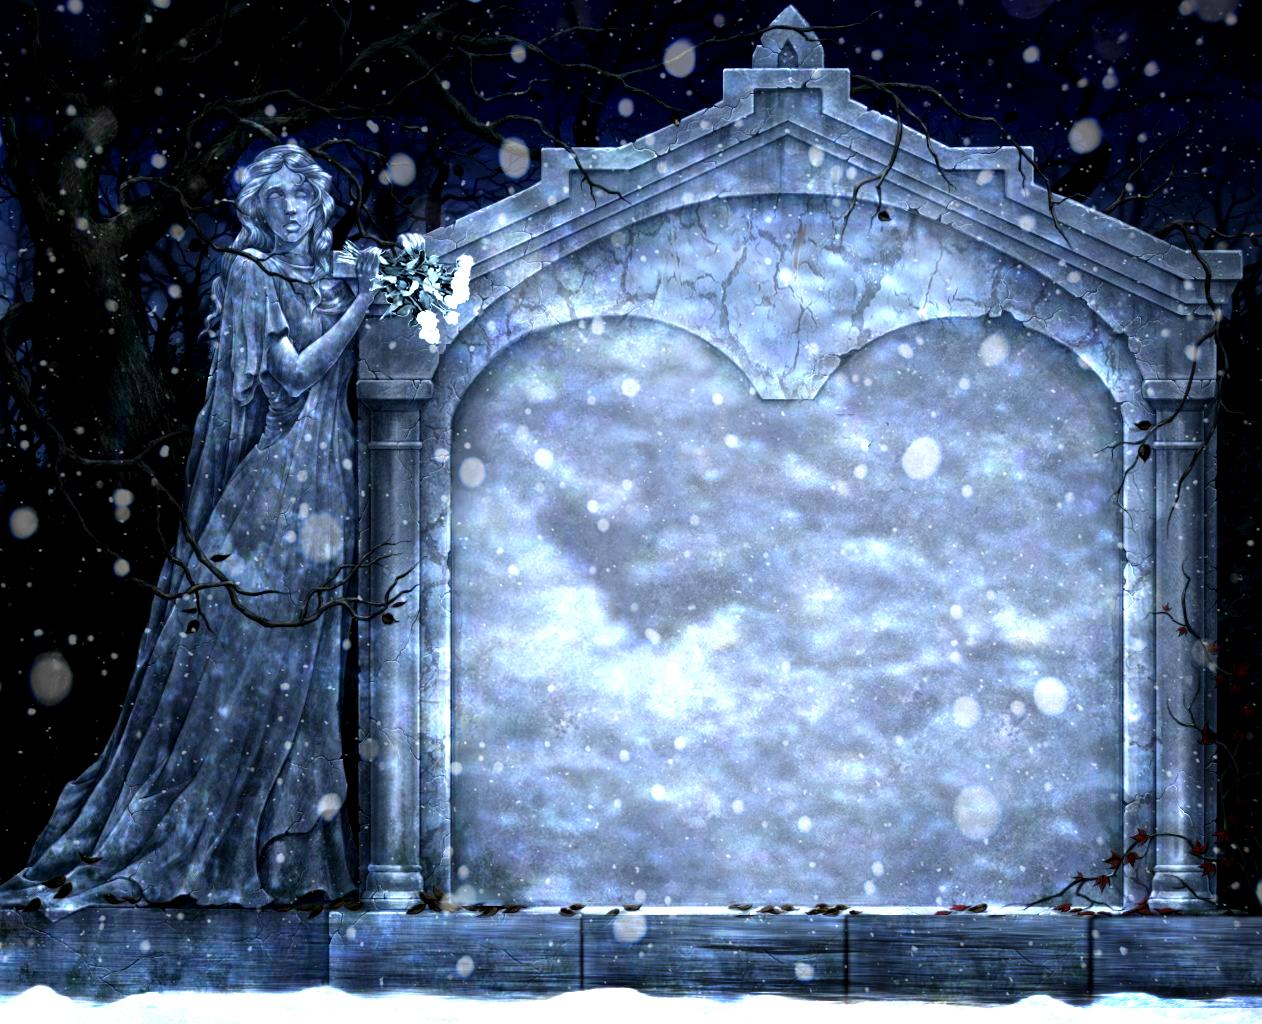 Winter Land Download Full Size By Queenobscurepairings On Deviantart